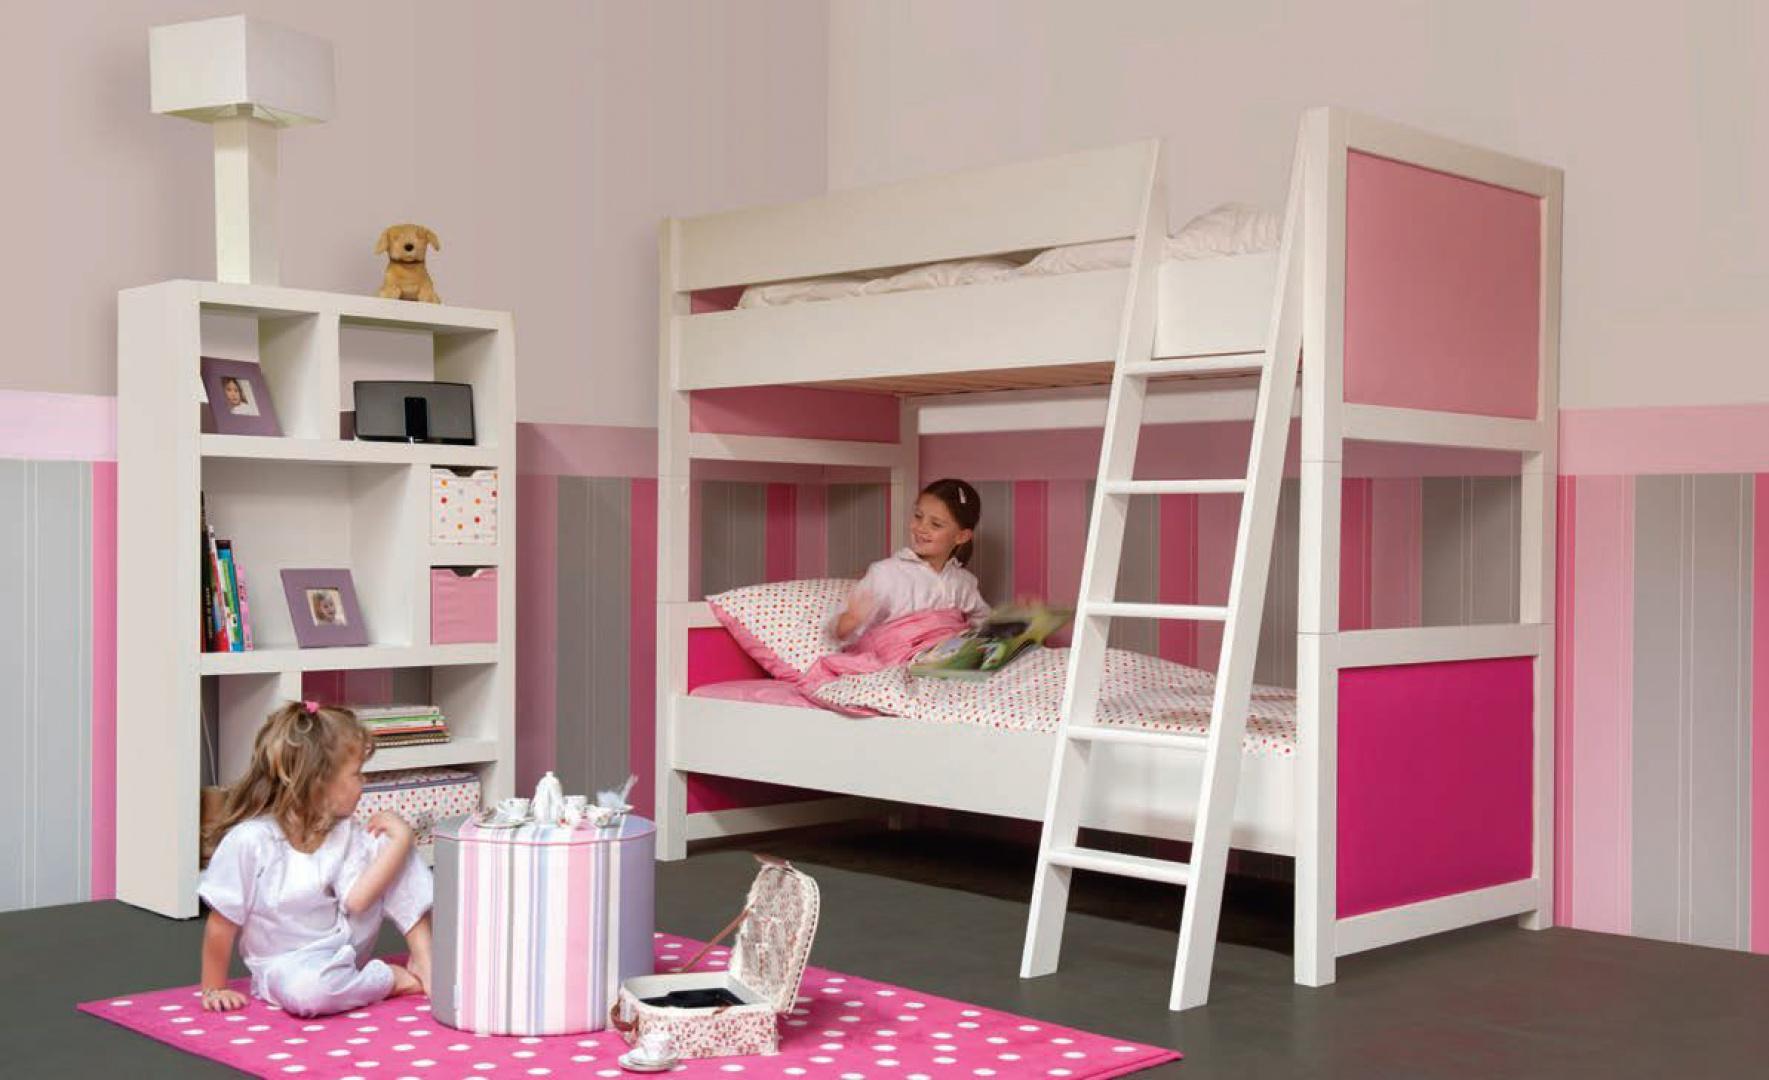 Pomysł na różowy pokój dla kilkuletnich sióstr. Fot. Pazapas.